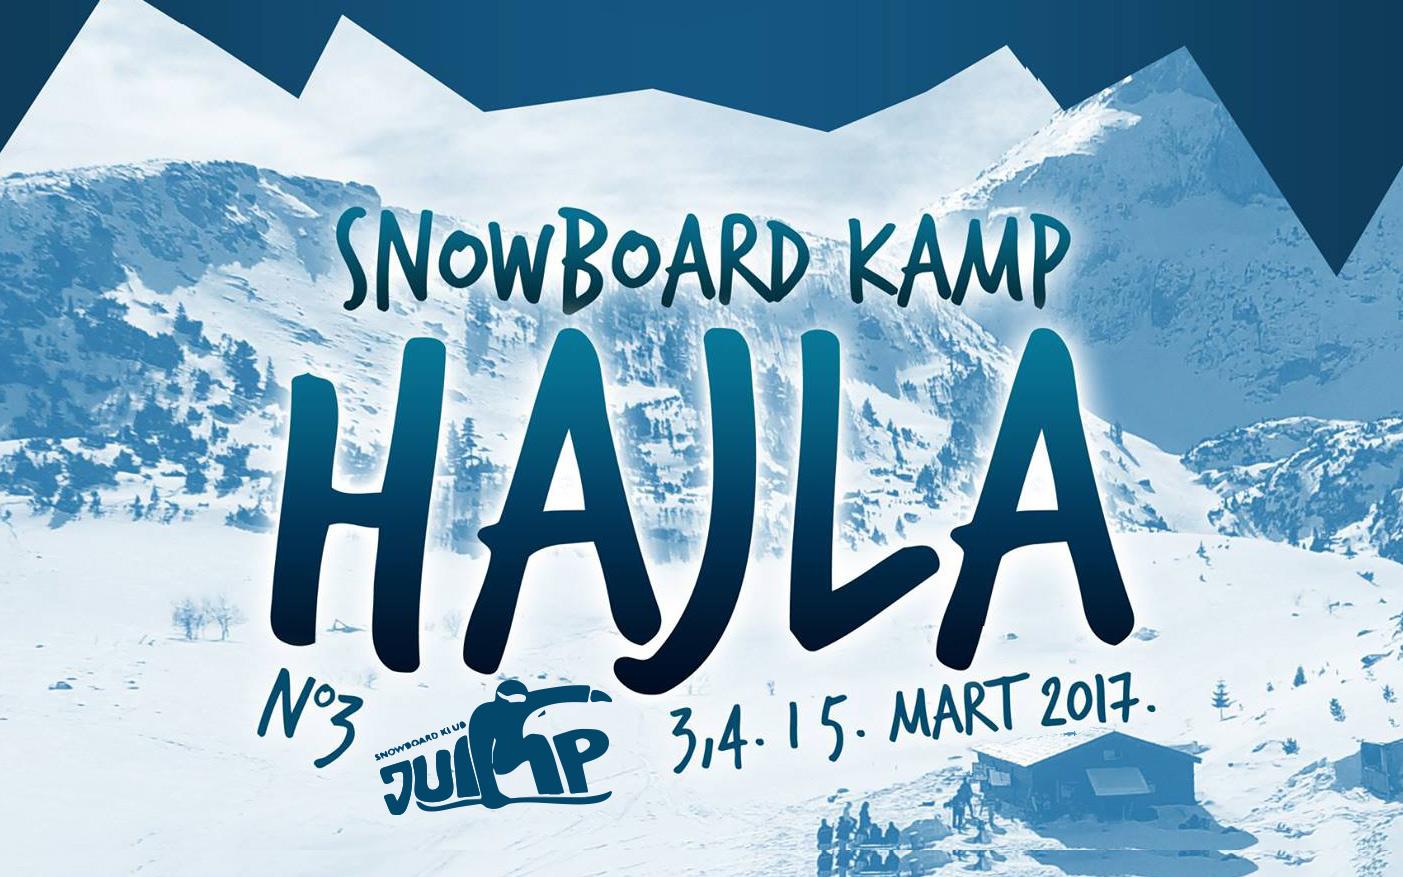 Treći SNOWBOARD KAMP HAJLA 2017